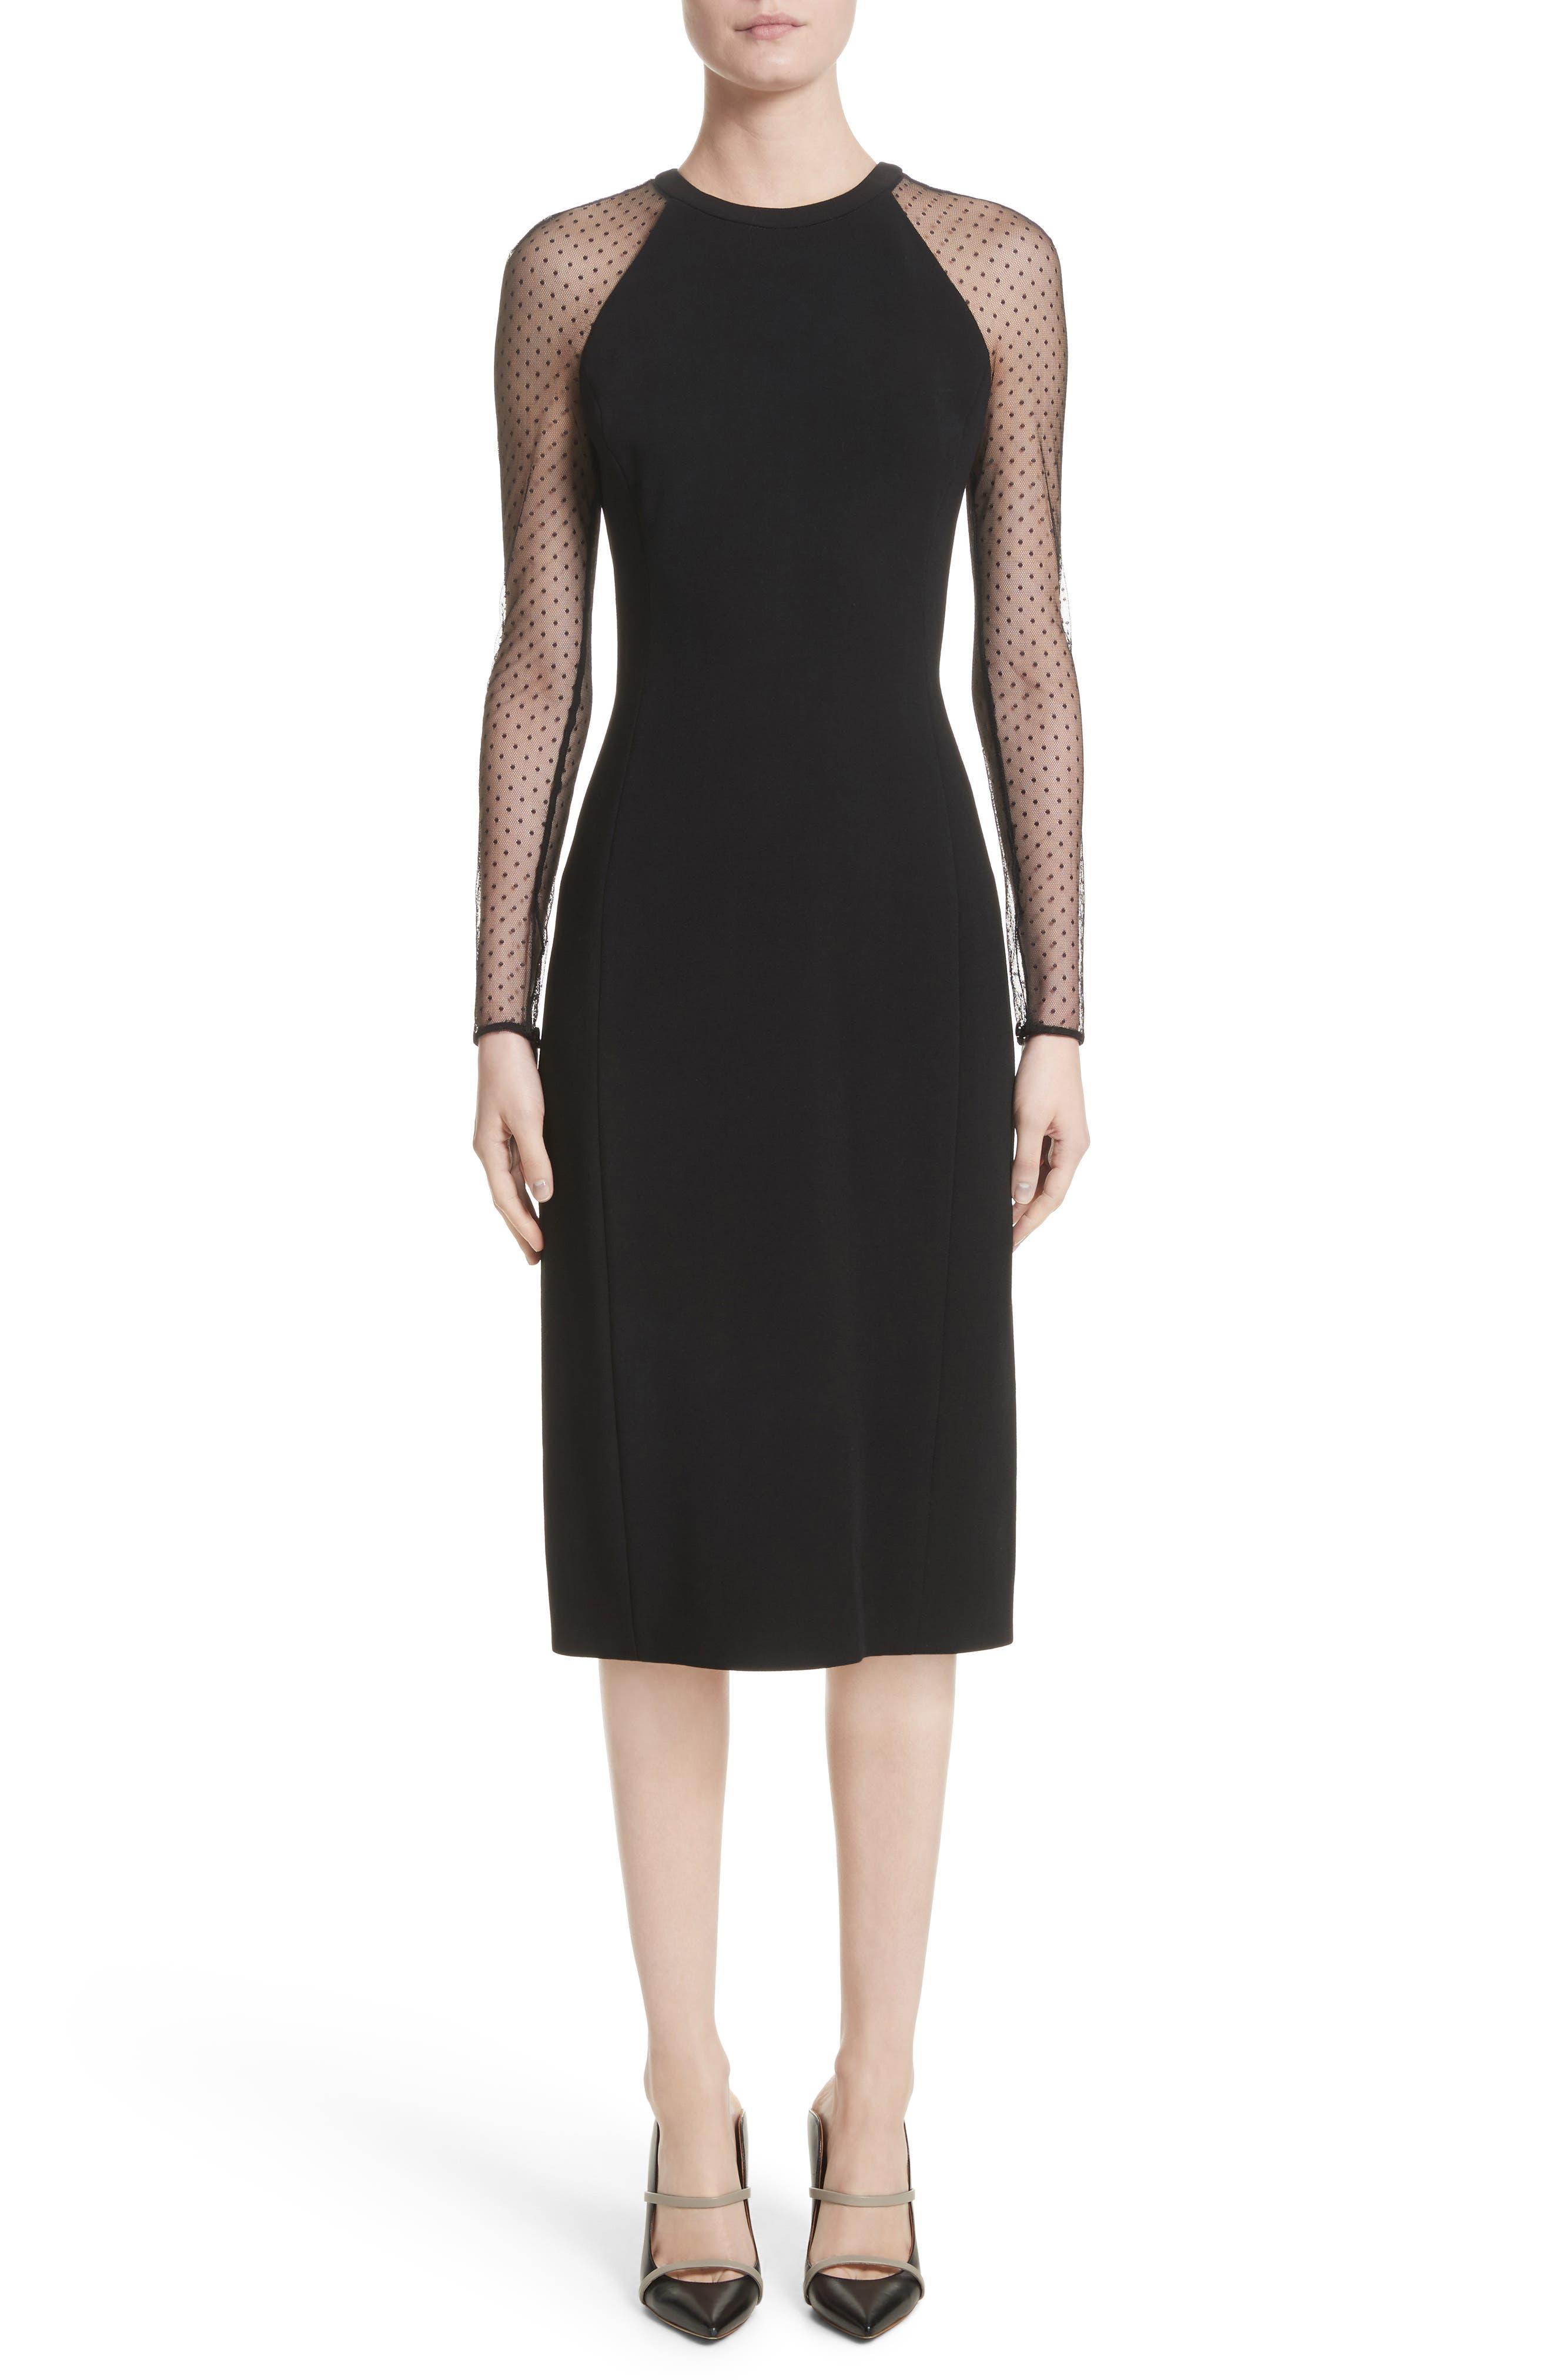 Jason Wu Collection Swiss Dot Sleeve Dress, Black